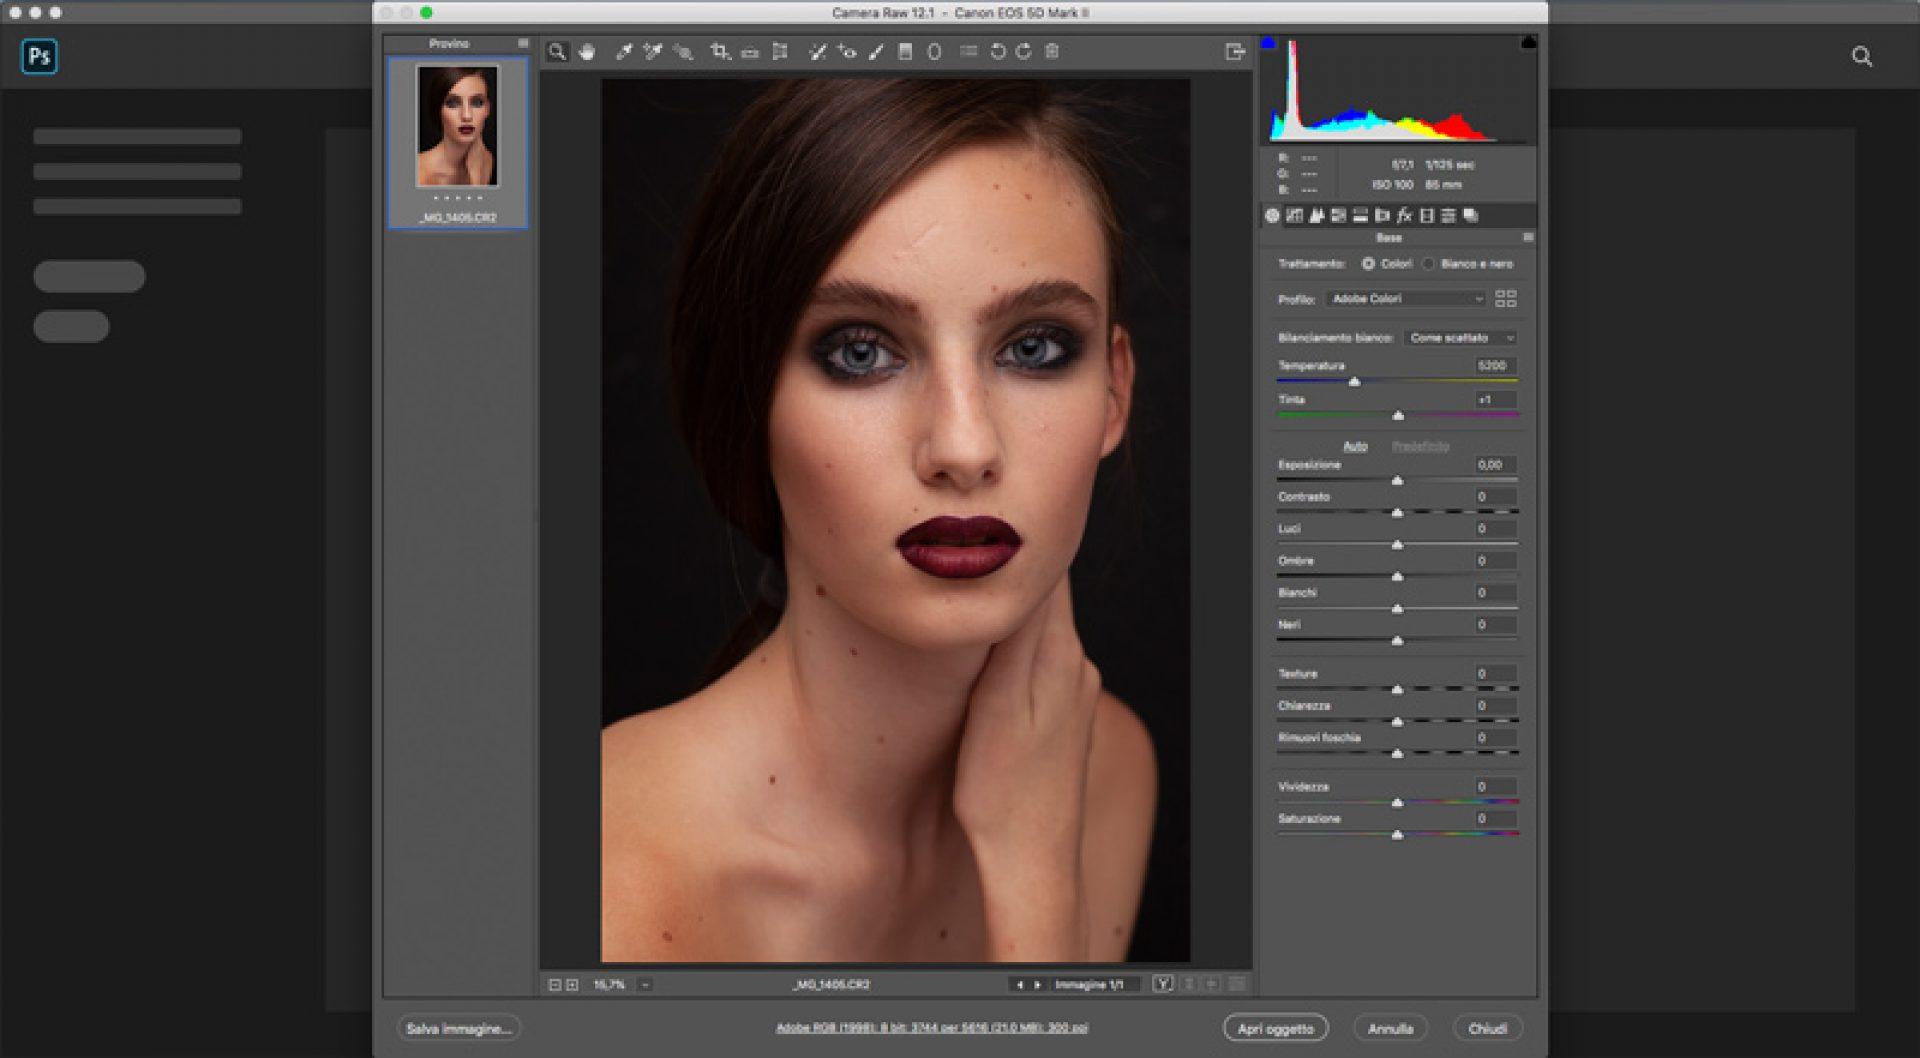 Adobe Photoshop Camera Raw